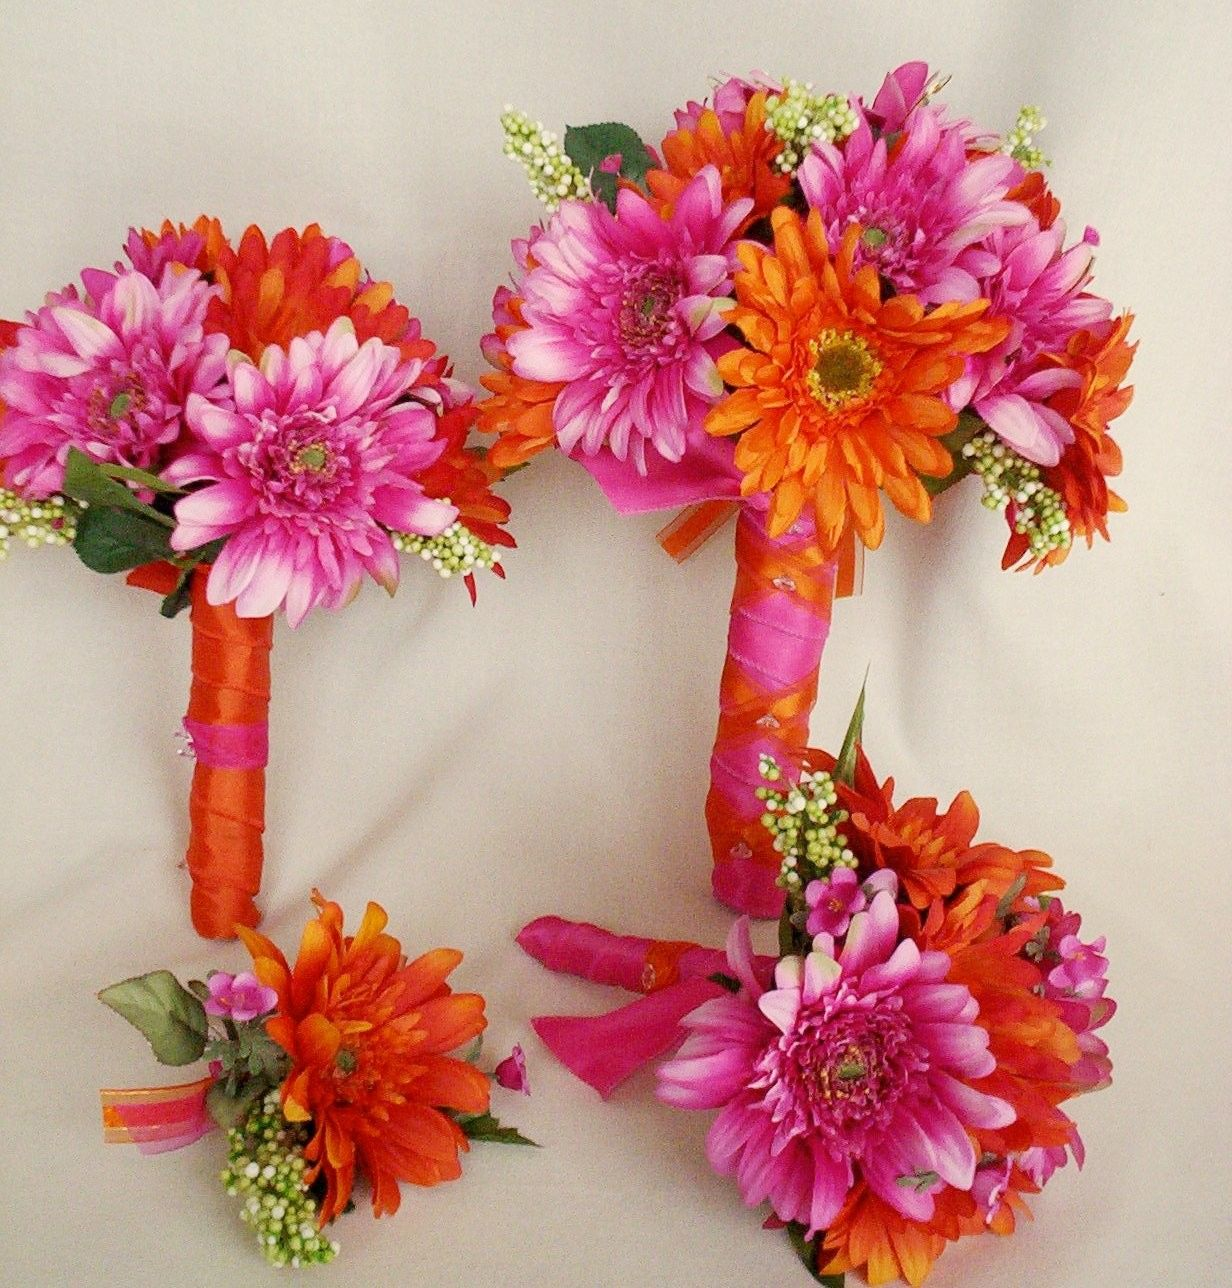 Red Gerbera Wedding Bouquets : Silk bridal bouquets hot pink orange wedding flower